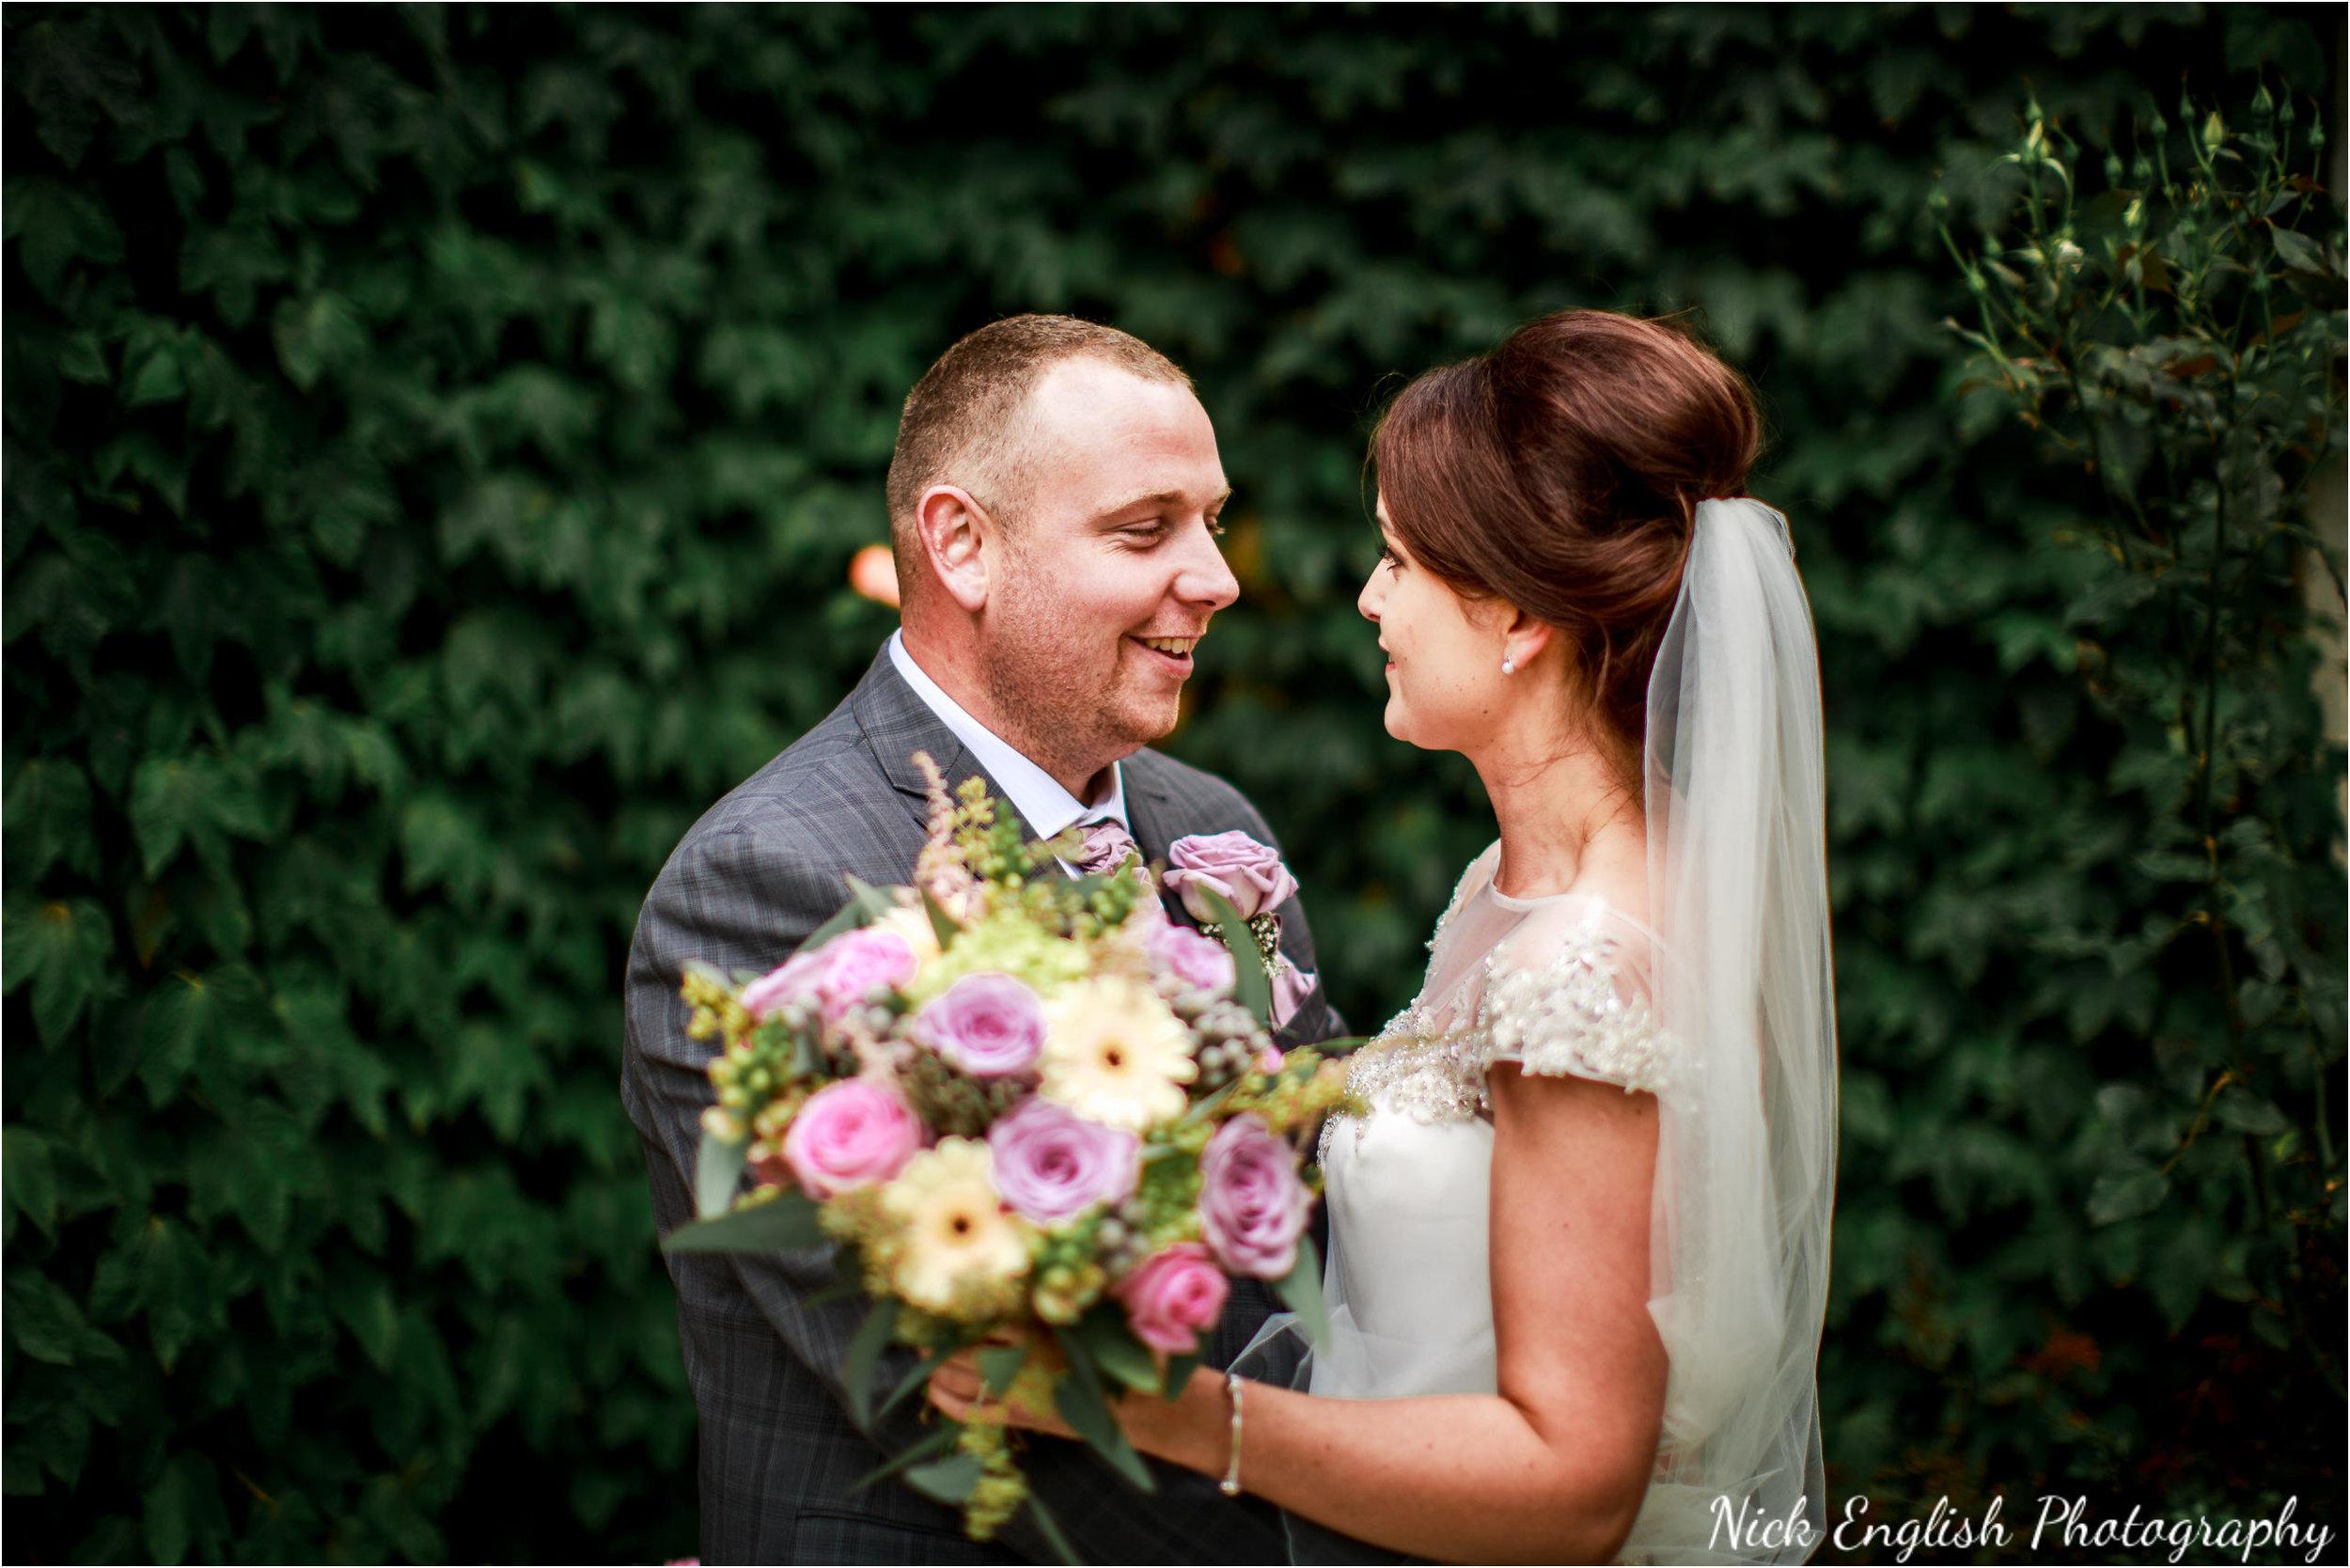 Stacey-Ash-Wedding-Photographs-Stanley-House-Preston-Lancashire-126.jpg